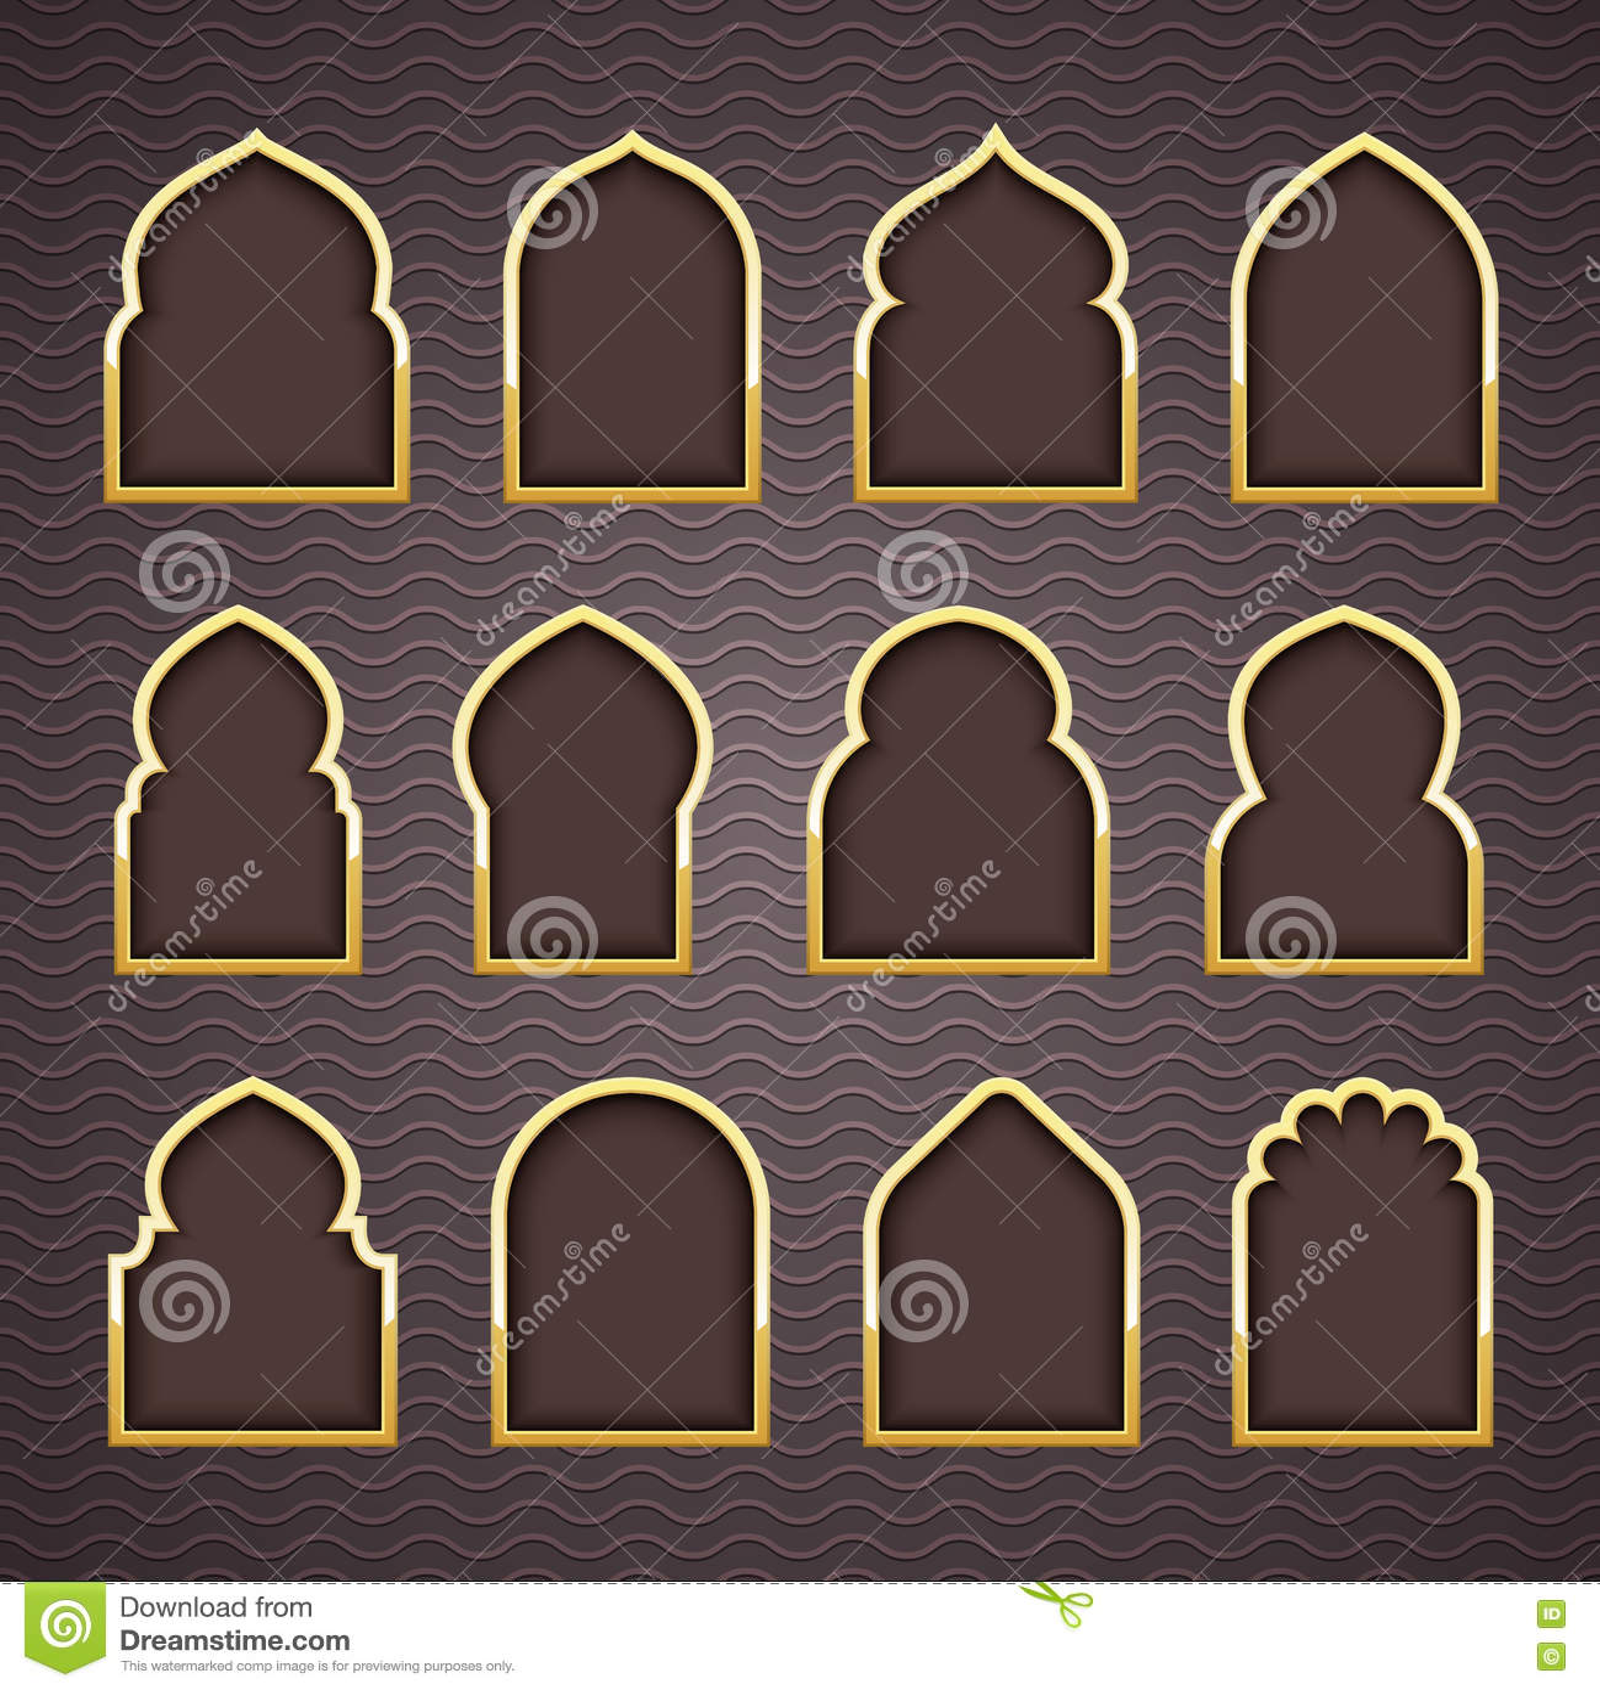 Gold Design Arab Window Ramadan Kareem. Stock Vector ... on jerusalem window, jesus window, valentines day window, thank you window, fashion window, new year window,